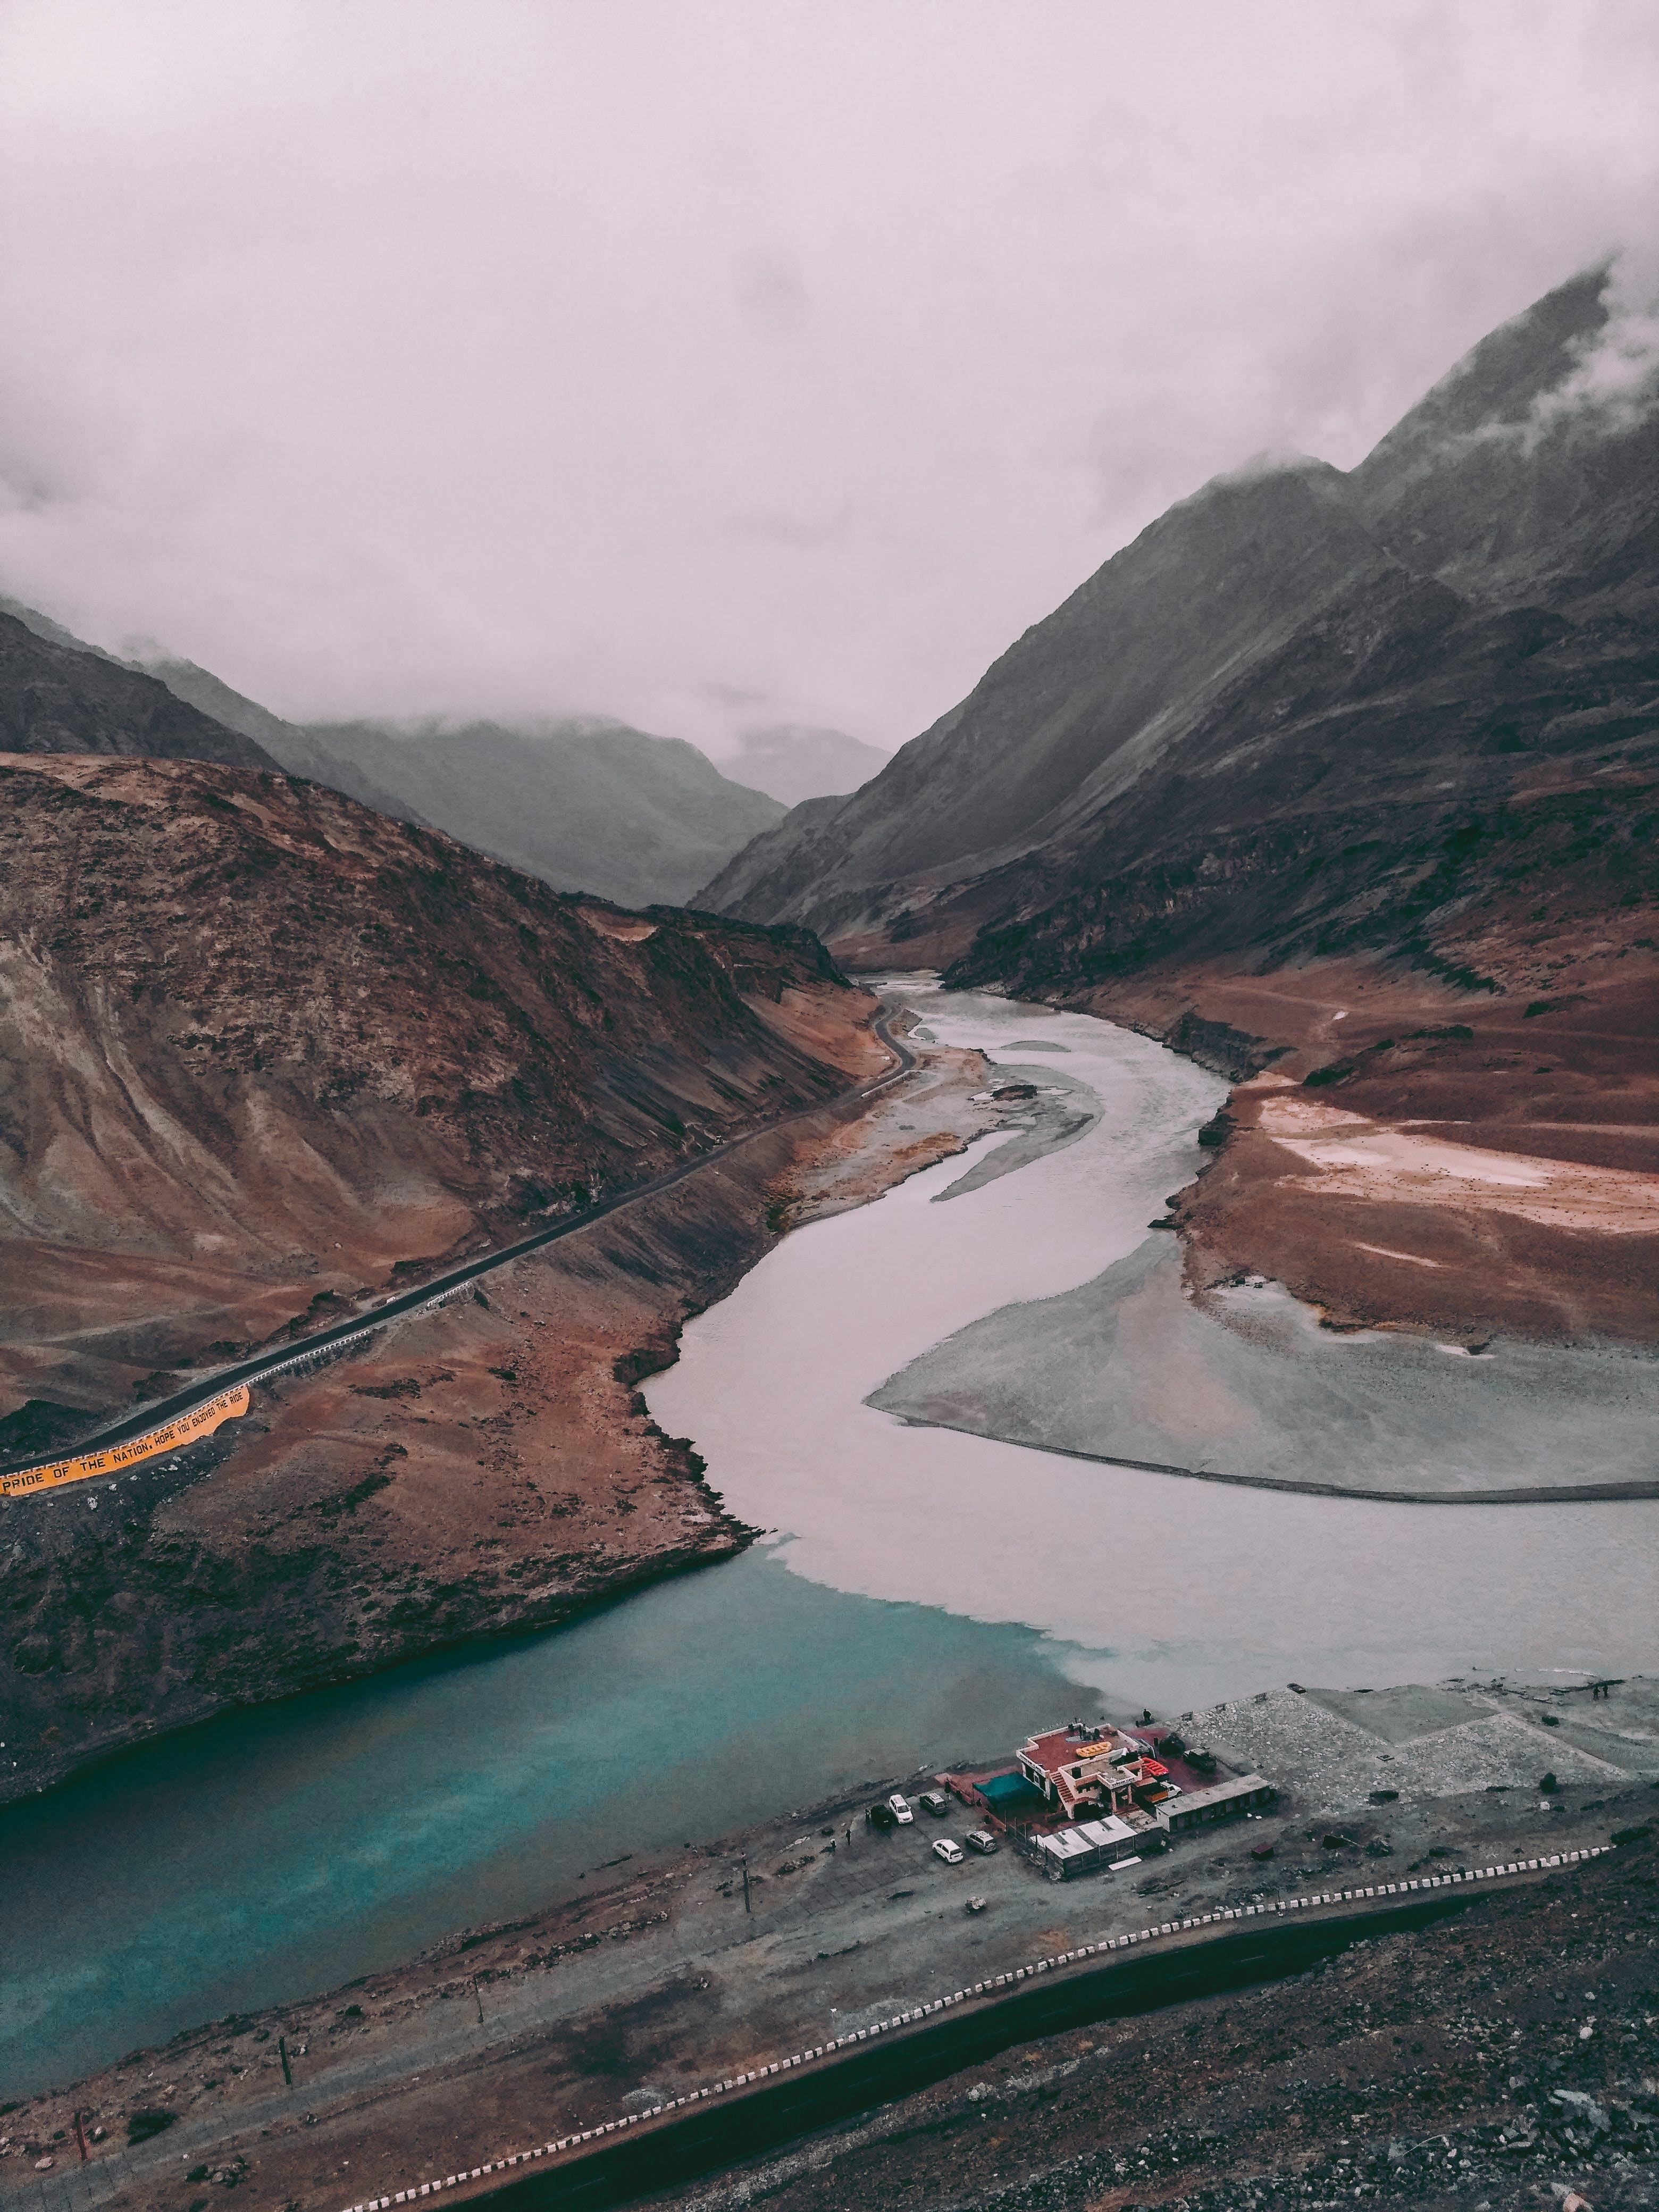 River in Between Two Roads